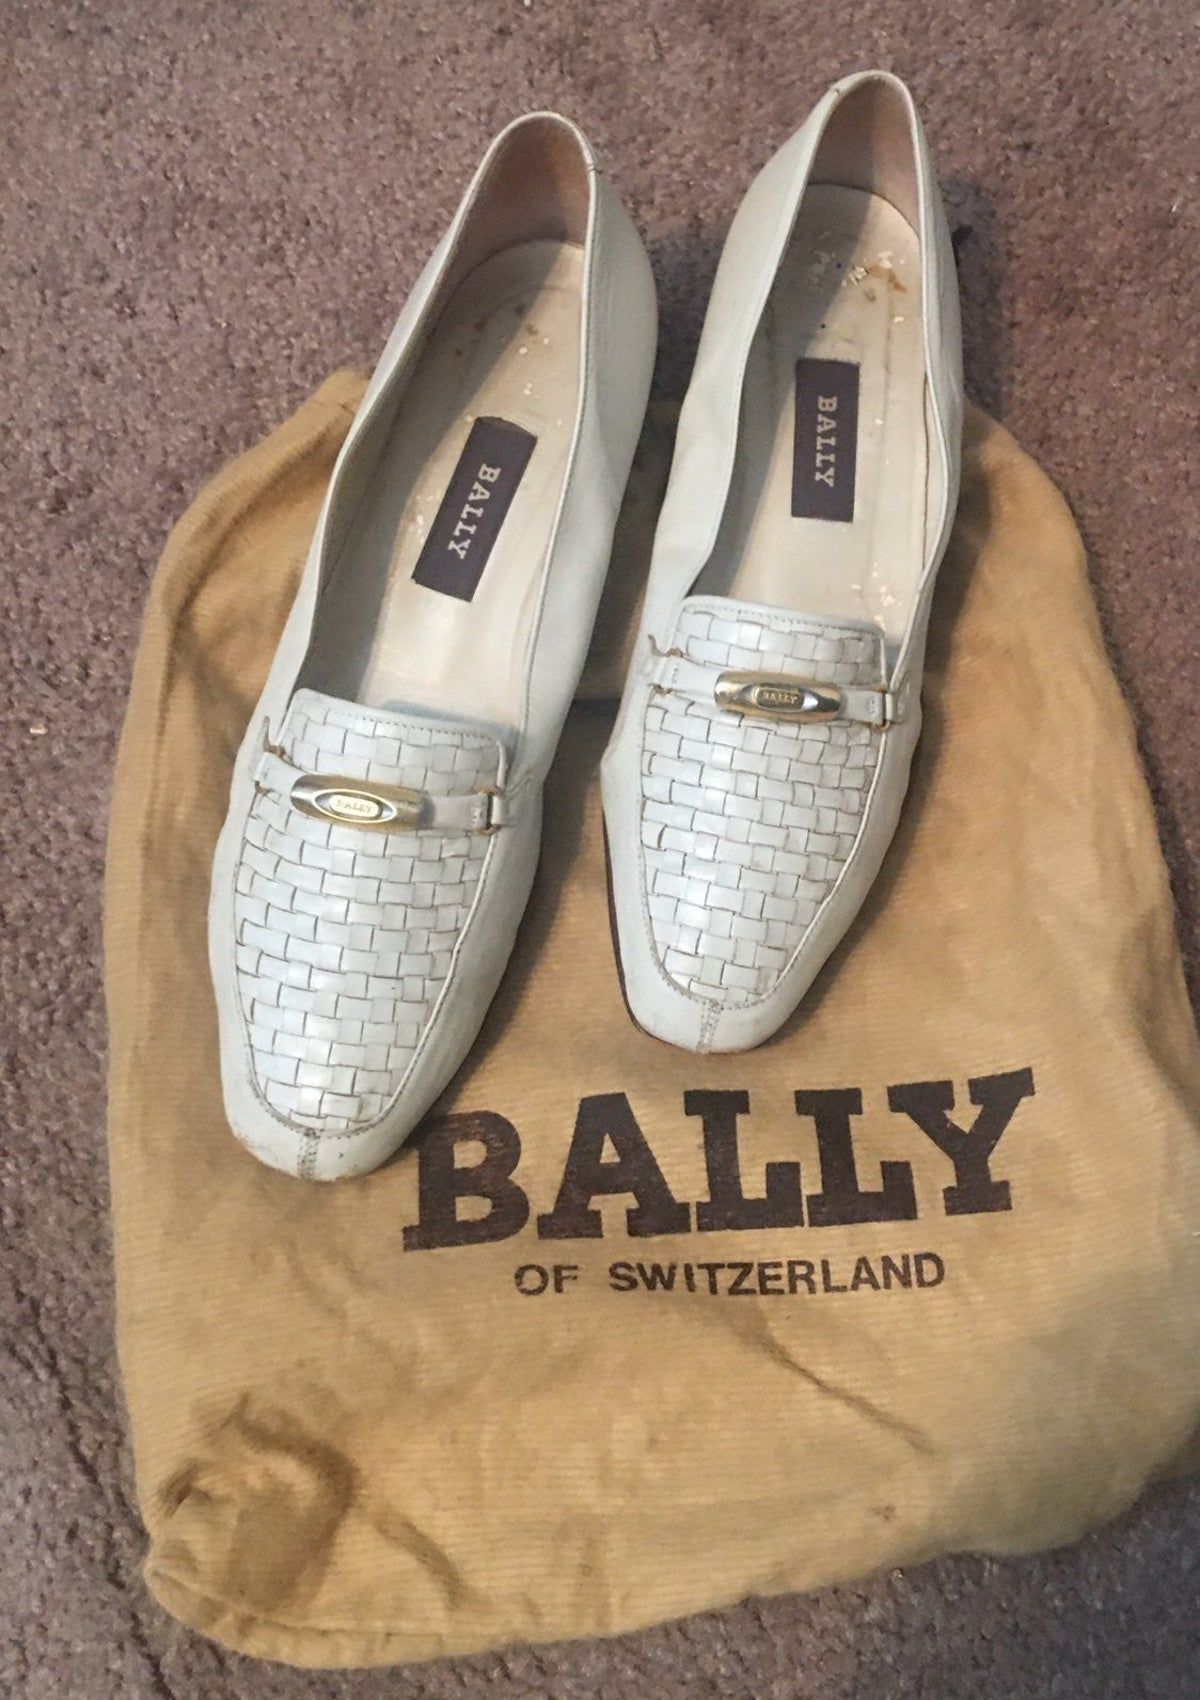 ", BALLY Italy VANESSA <a href=""http://7.5m/"">http://7.5m/</a> woven flats, Anja Rubik Blog, Anja Rubik Blog"